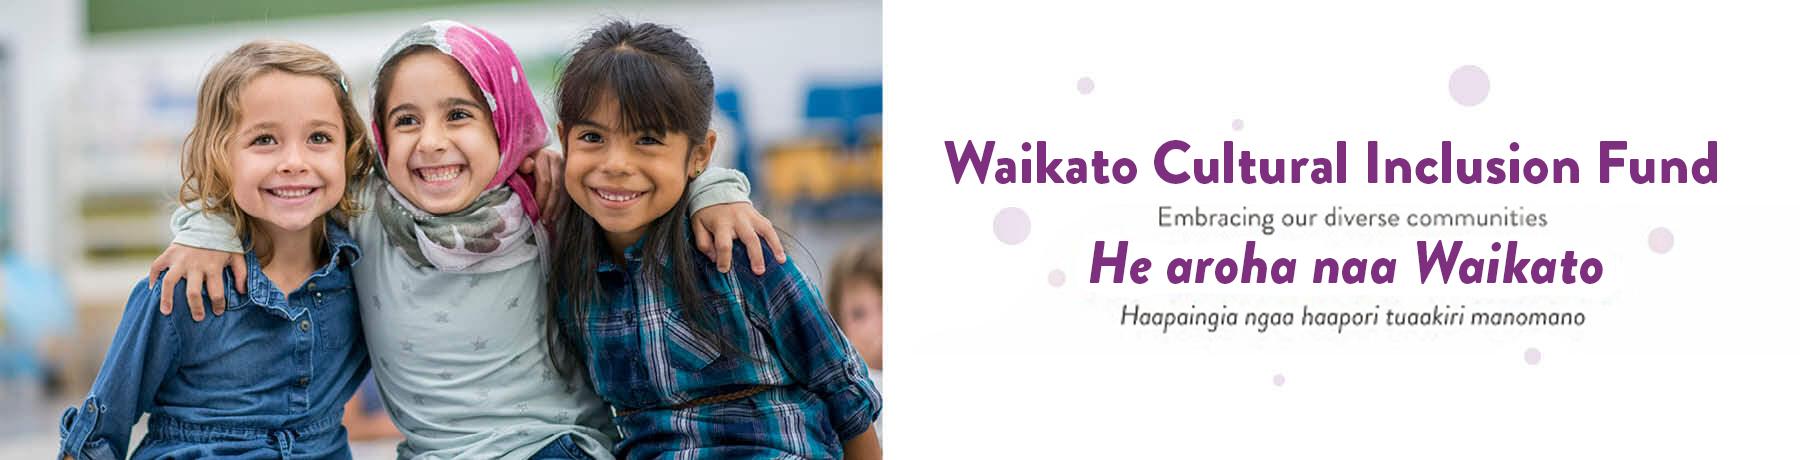 Waikato Inclusion